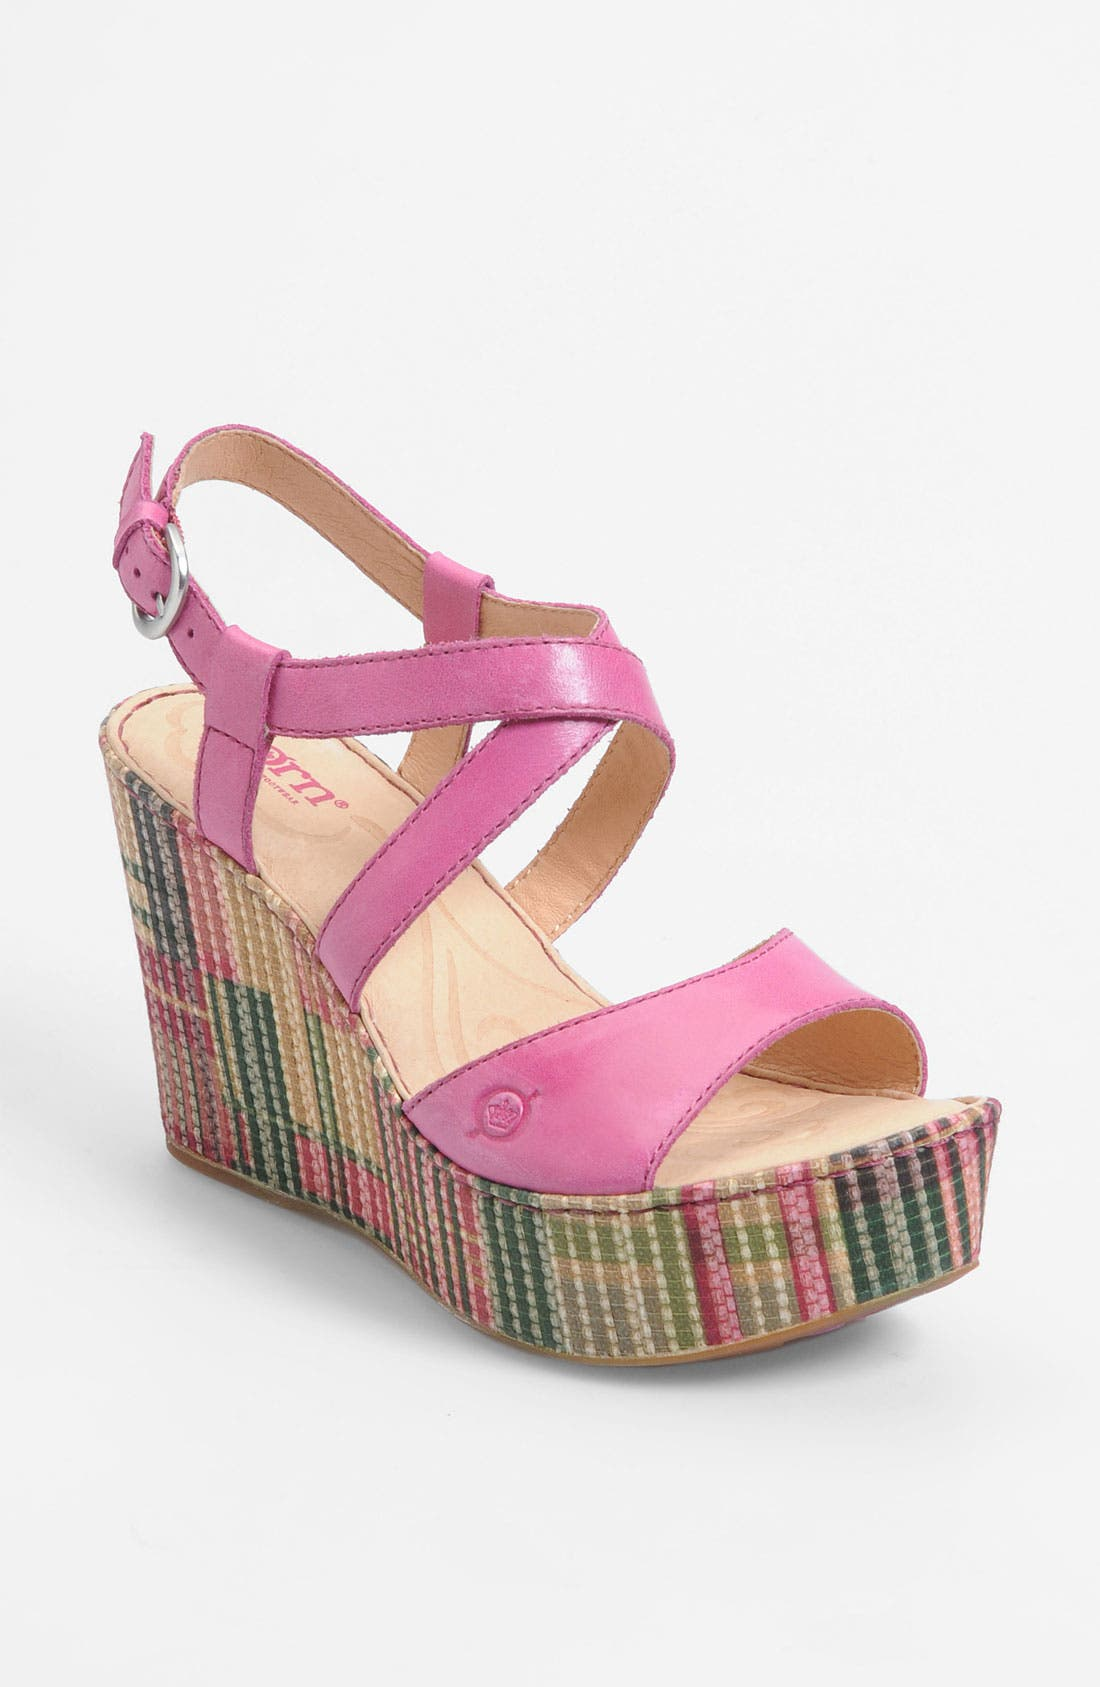 Alternate Image 1 Selected - Børn 'Caicos' Sandal